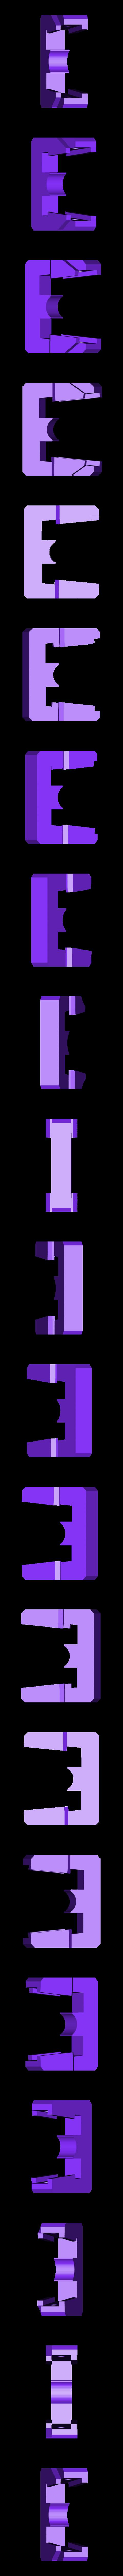 Rotate-Tool04.stl Download free STL file Turboprop Engine Modified Parts (No.2) • 3D printable design, konchan77